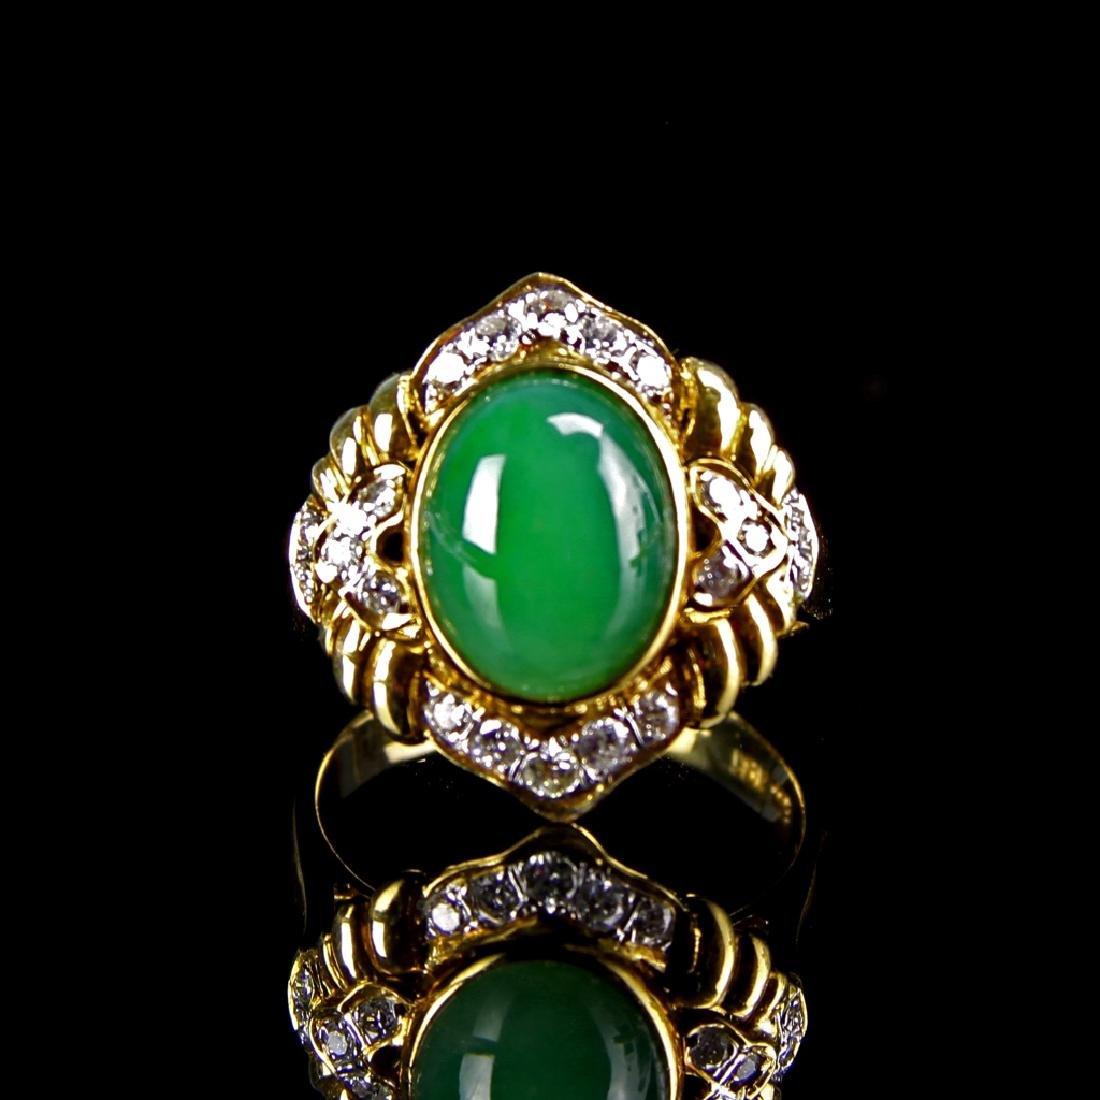 Chinese Jadeite And 18K Gold Ring